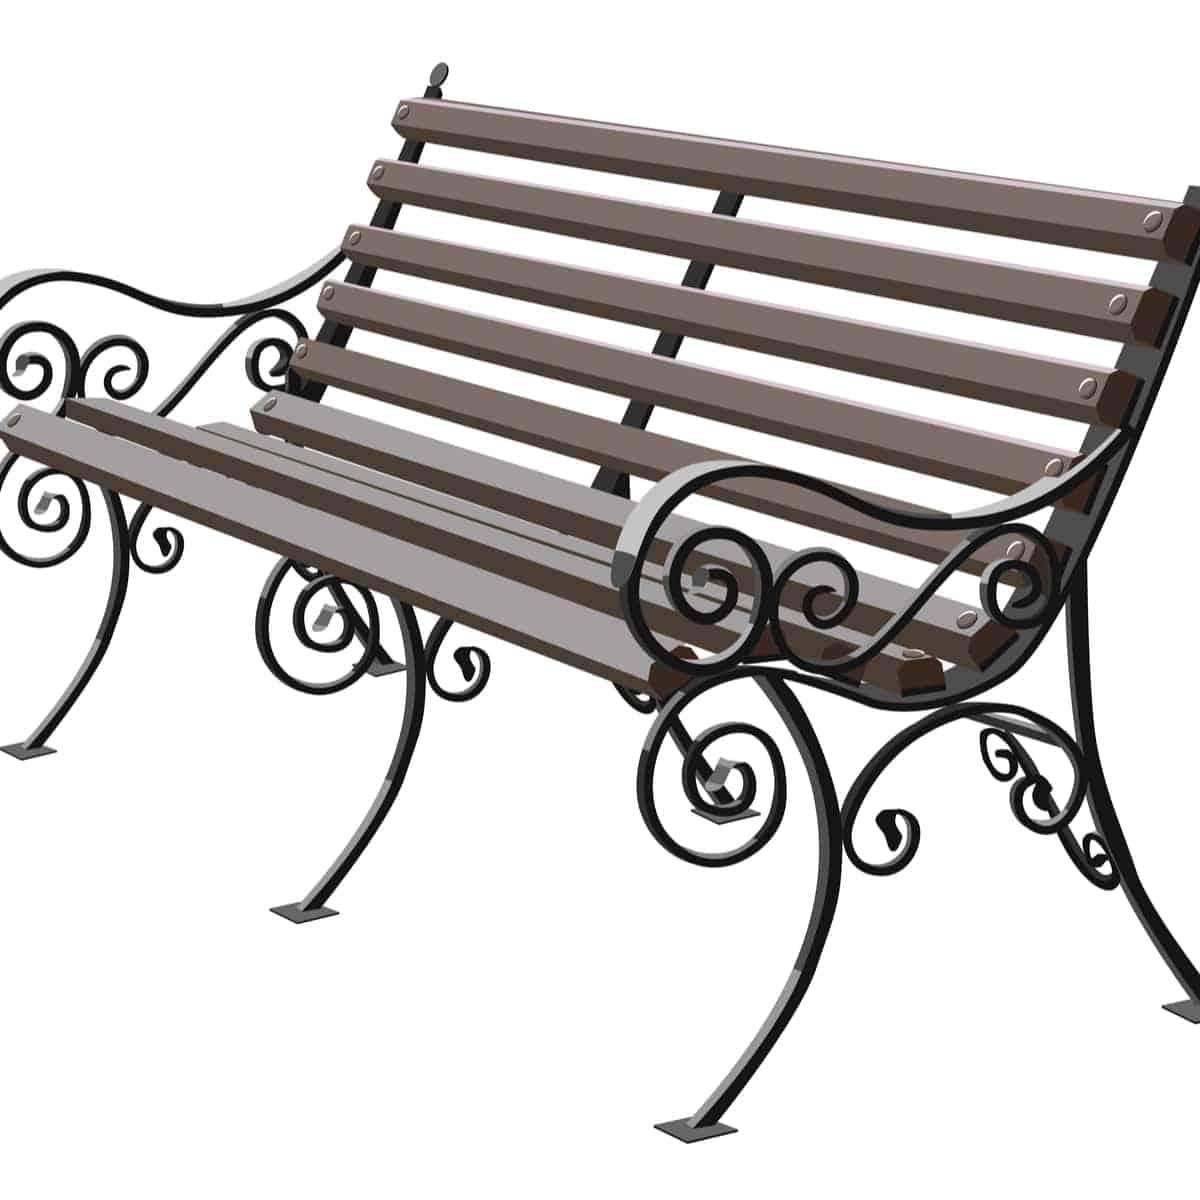 Terrific 28 Types Of Outdoor Patio Deck And Garden Furniture Photos Machost Co Dining Chair Design Ideas Machostcouk